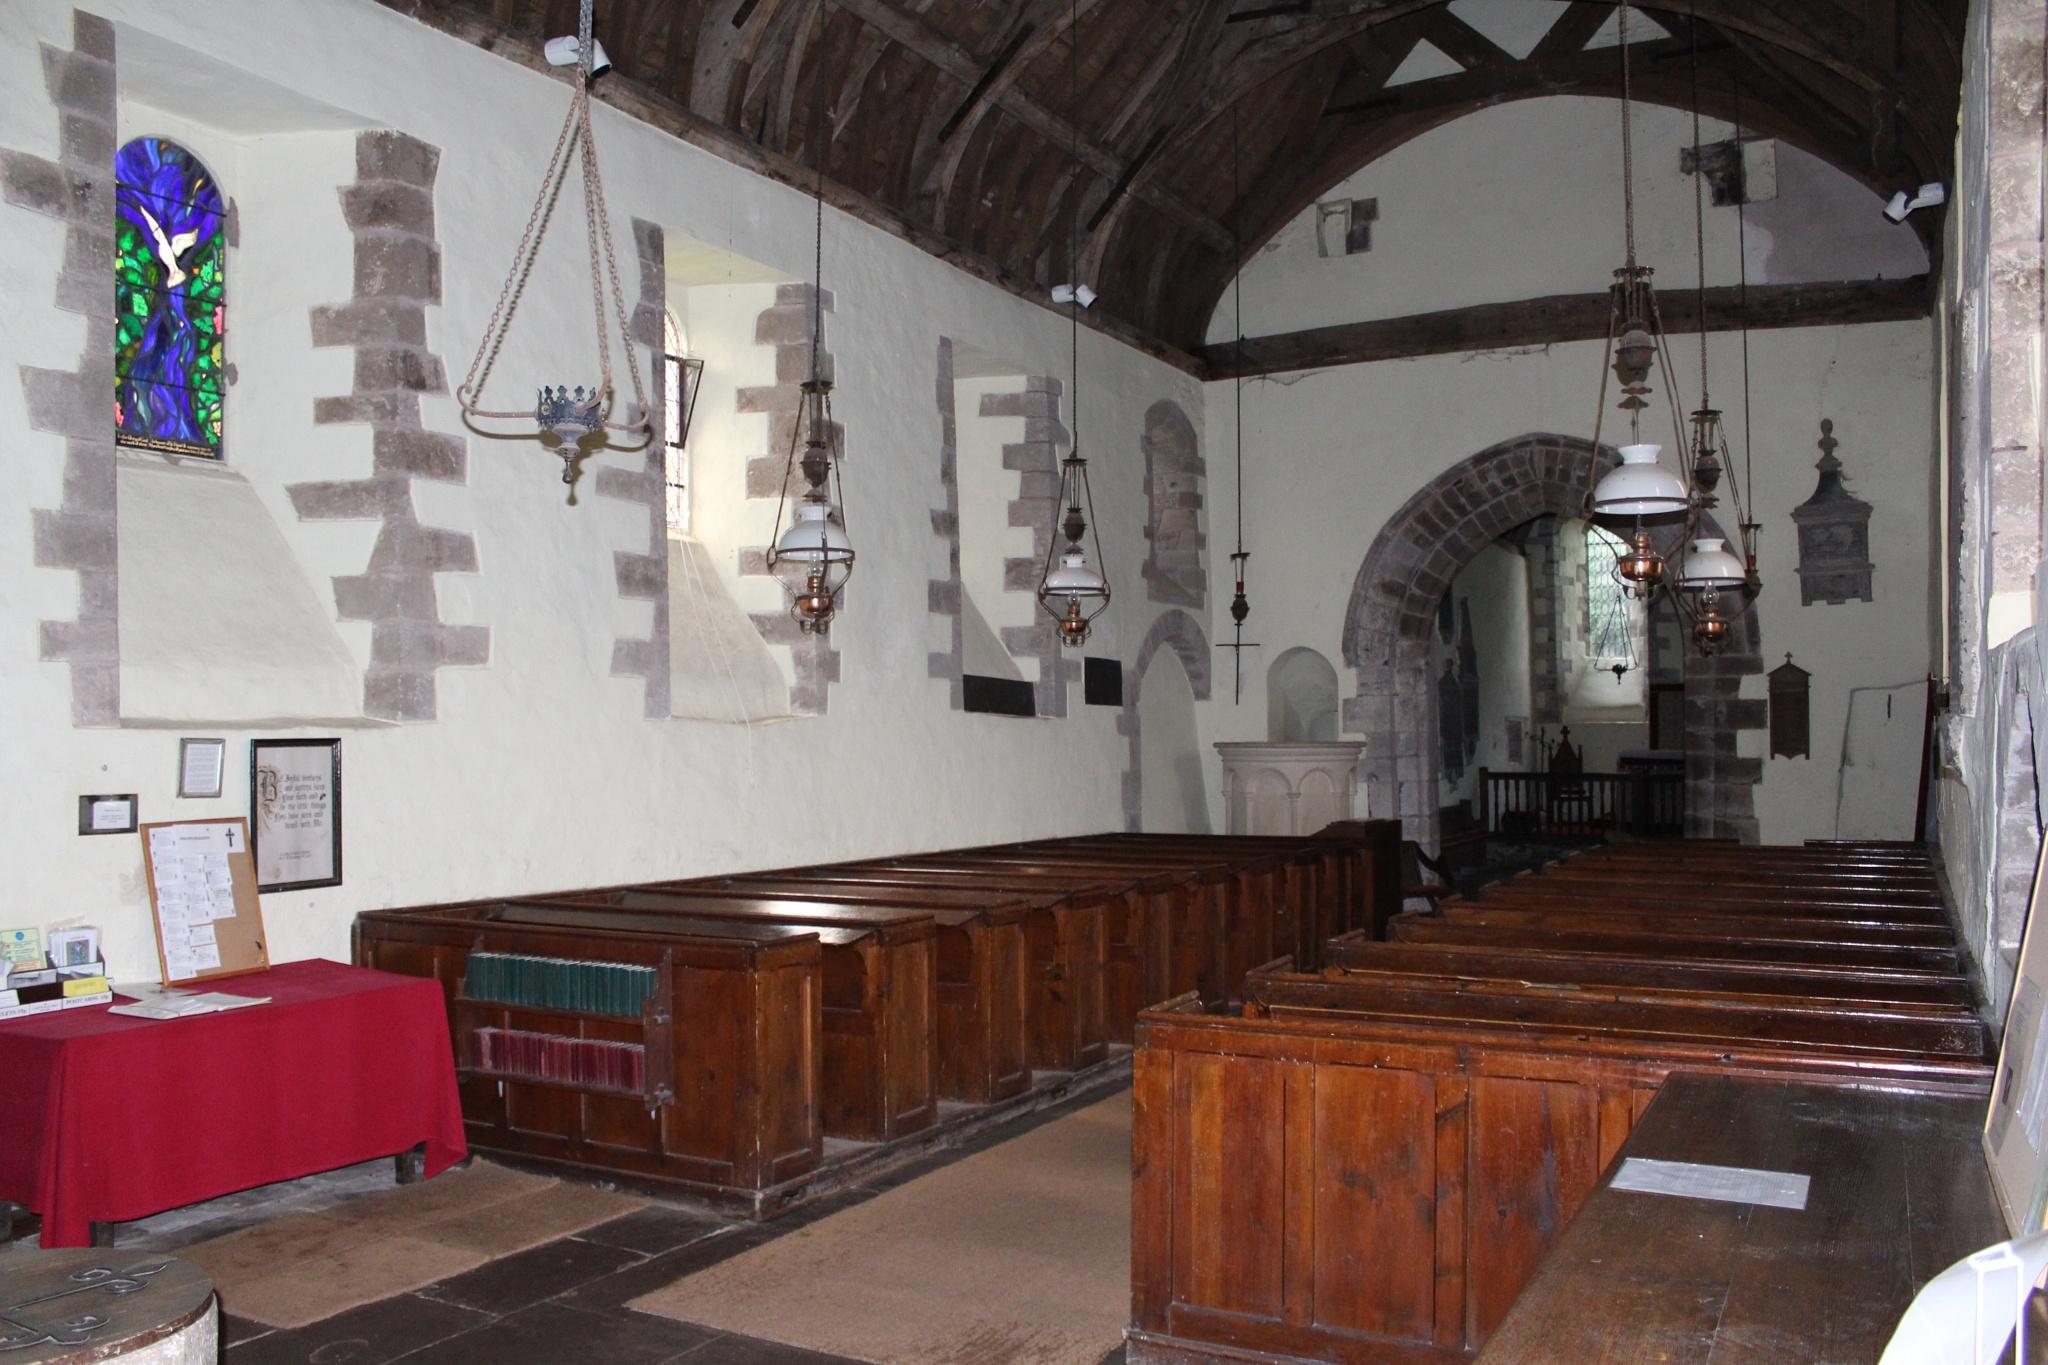 Eglwys by drgeorgebaileybailey8